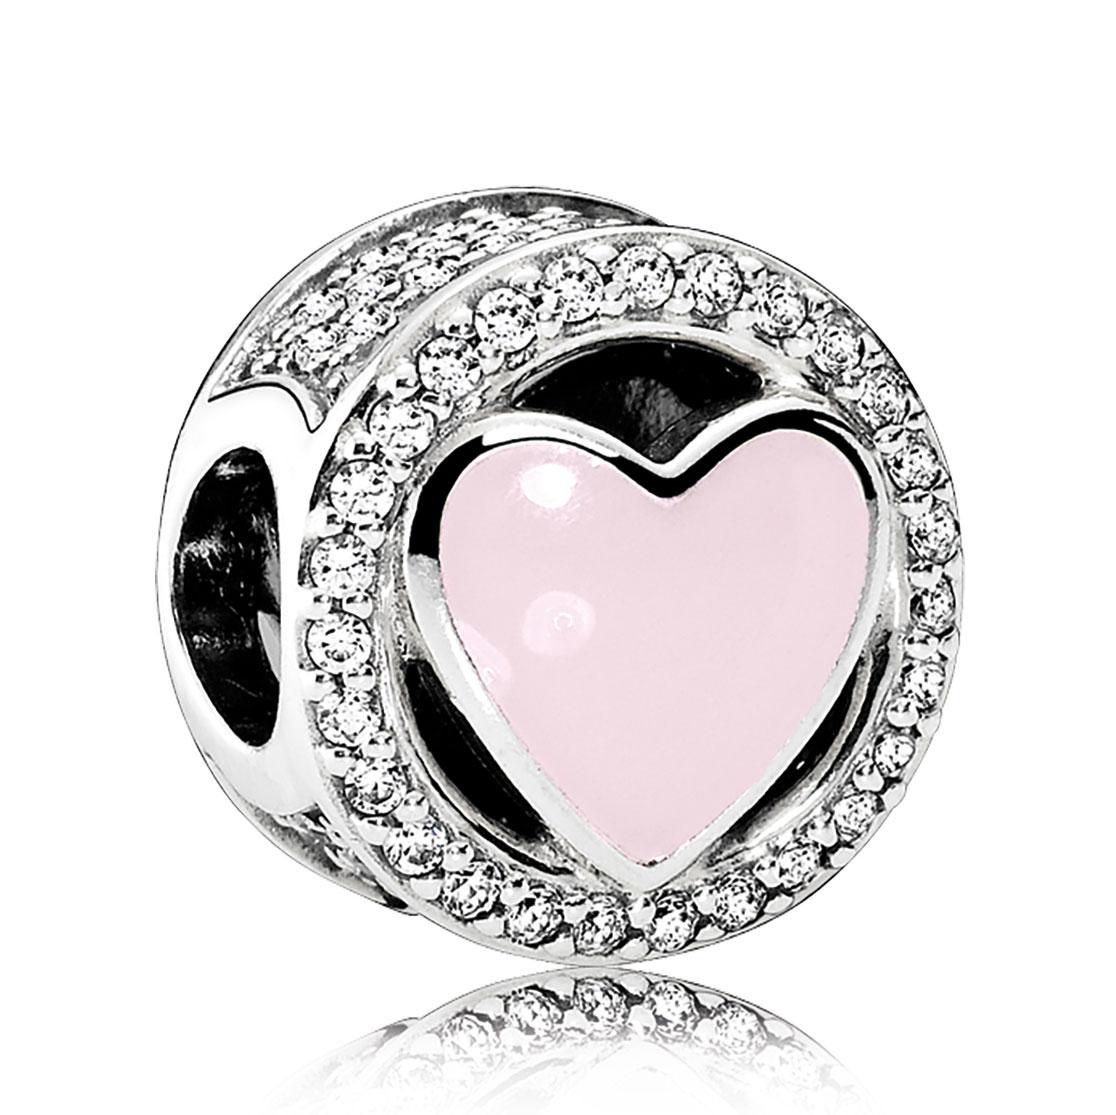 Pandora Women's Silver Cubic Zirconia Charm yDJ0rOs